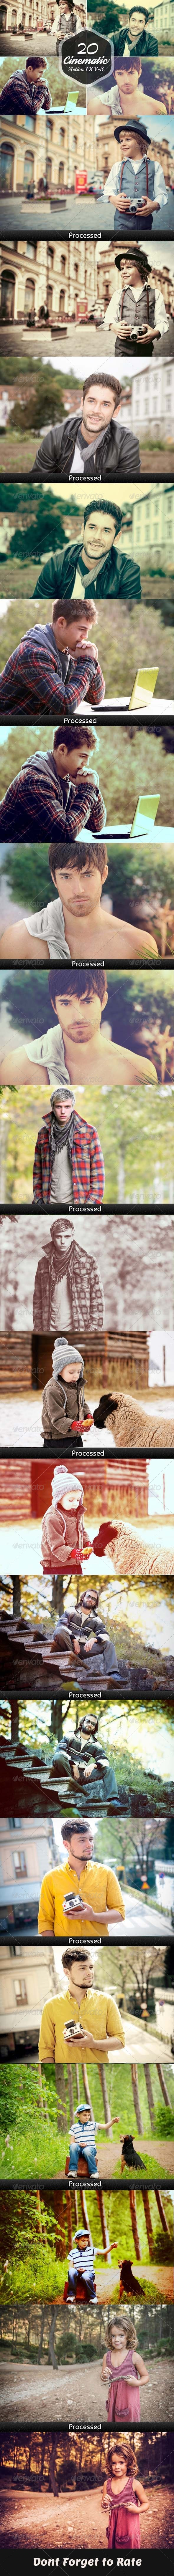 GraphicRiver 20 Cinematic Photoshop Actions Vol.3 8032227